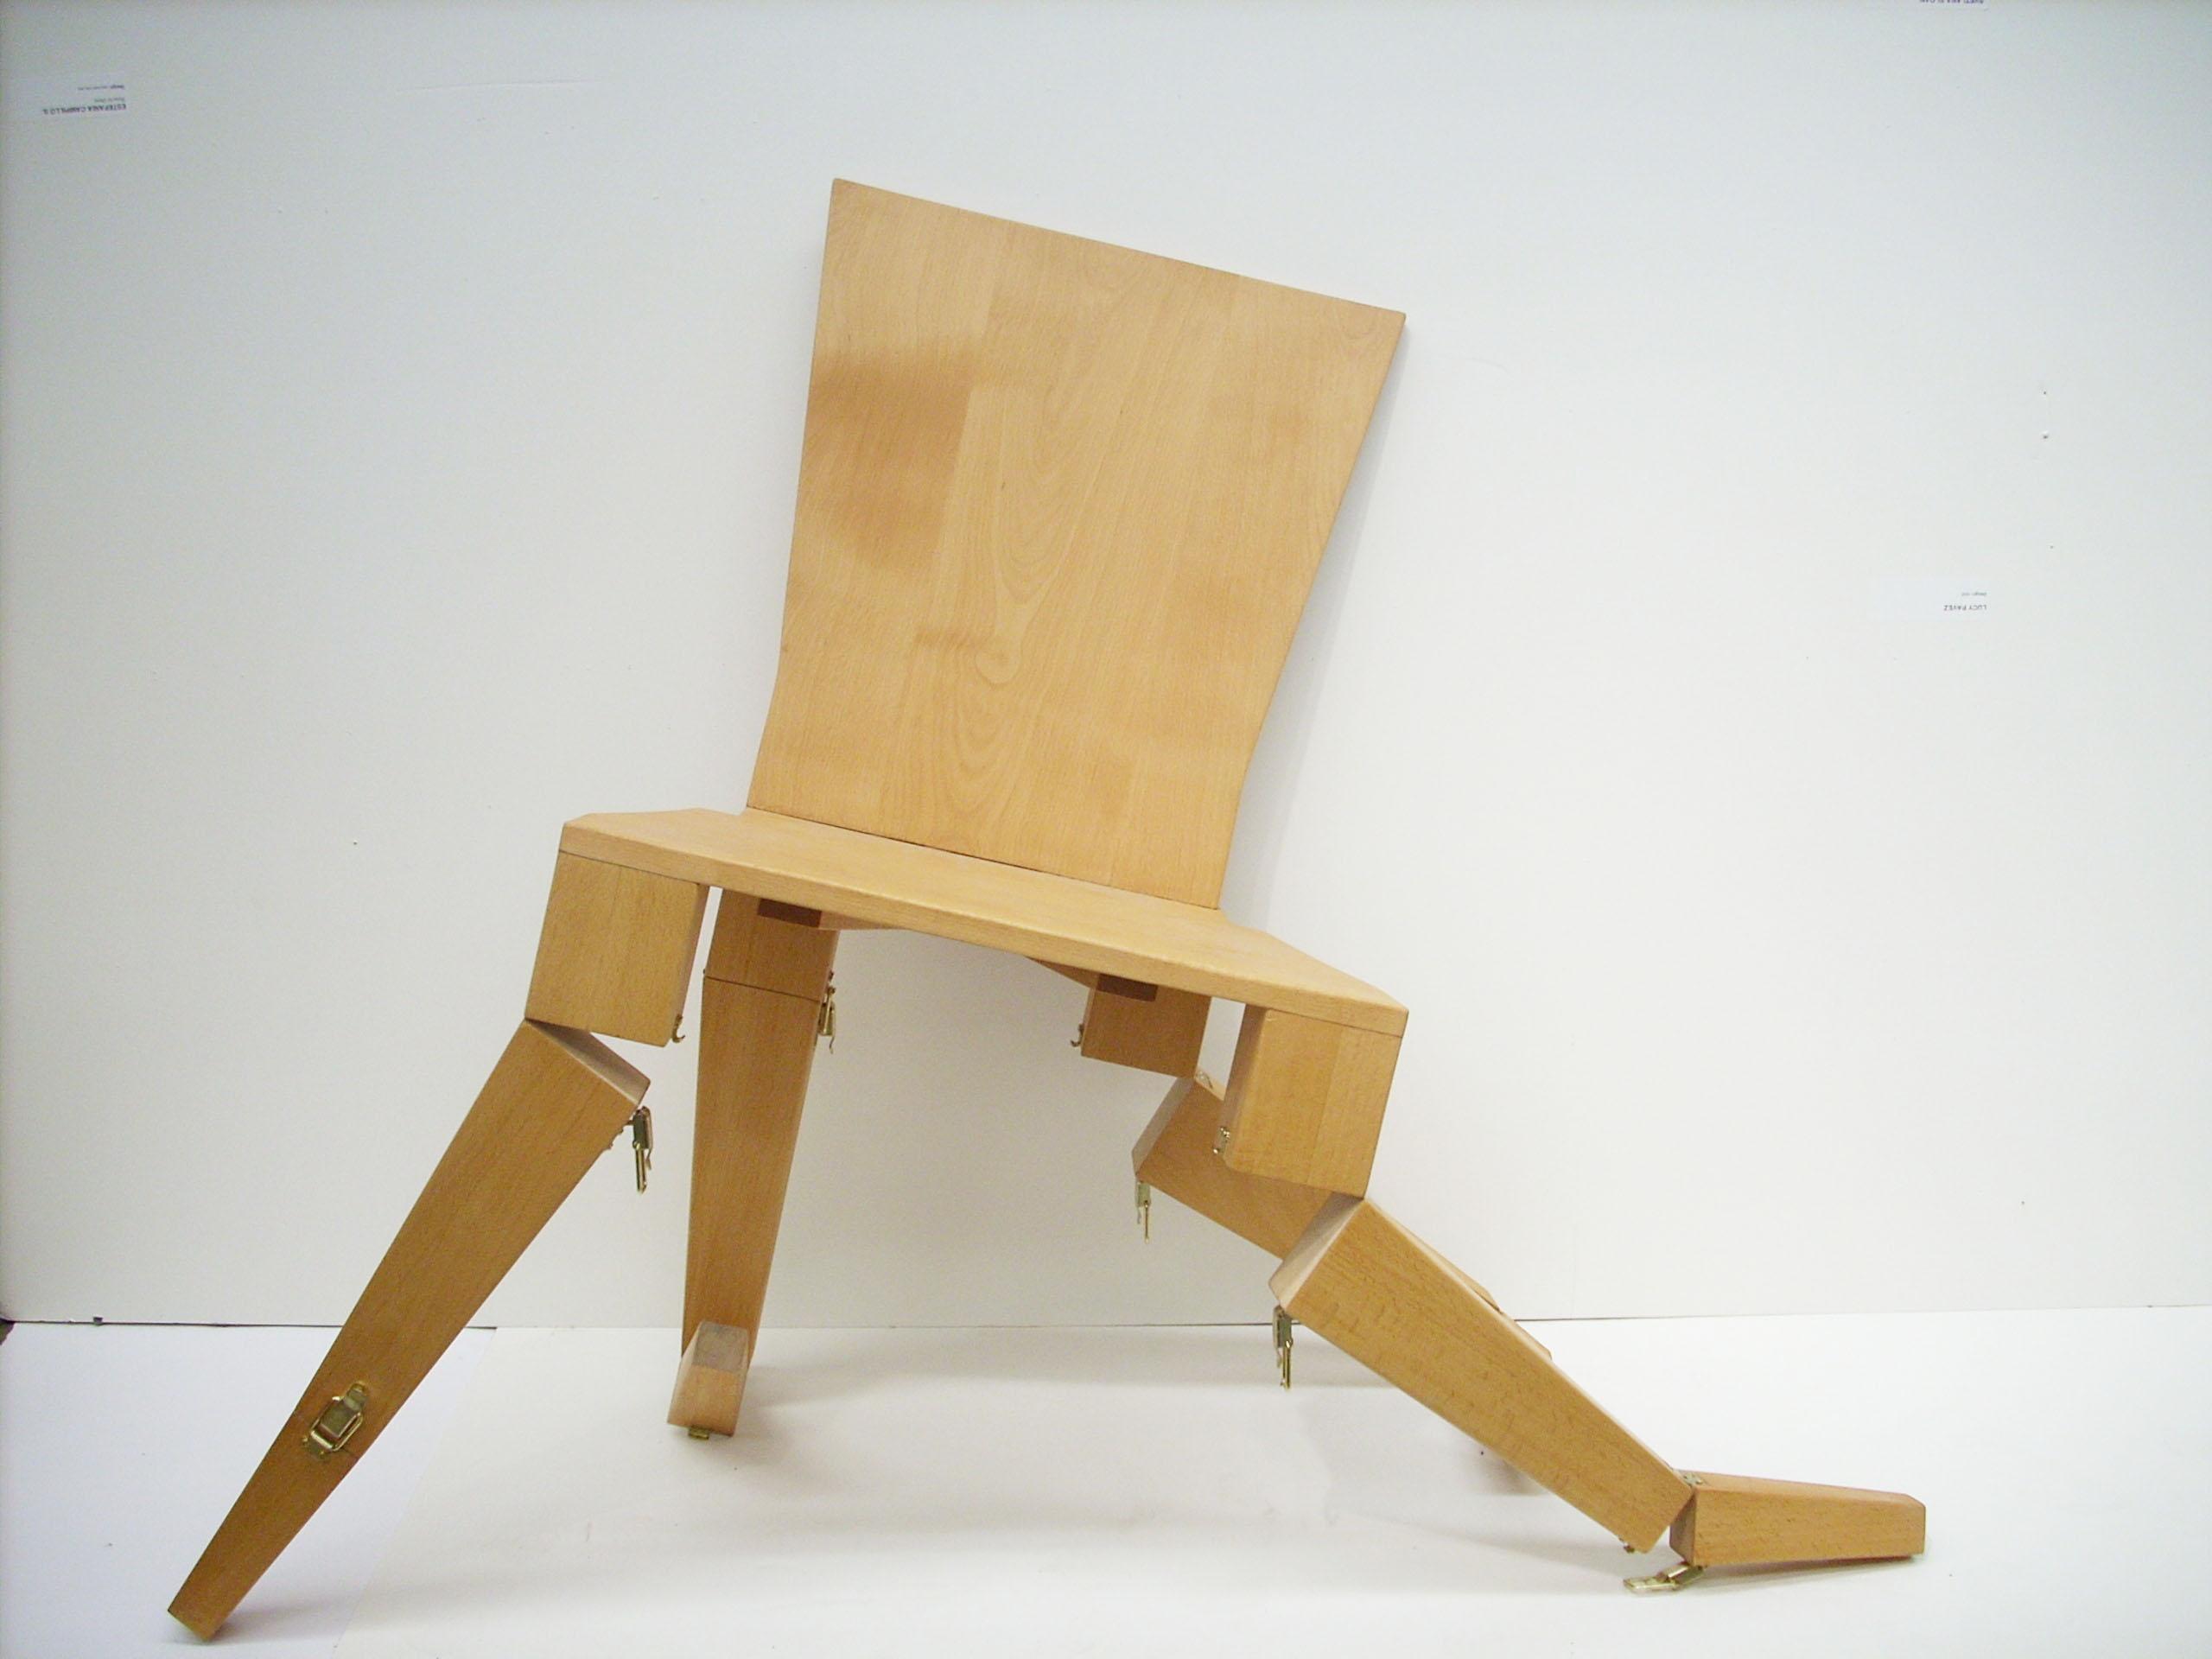 Ordinaire Crazy Chair